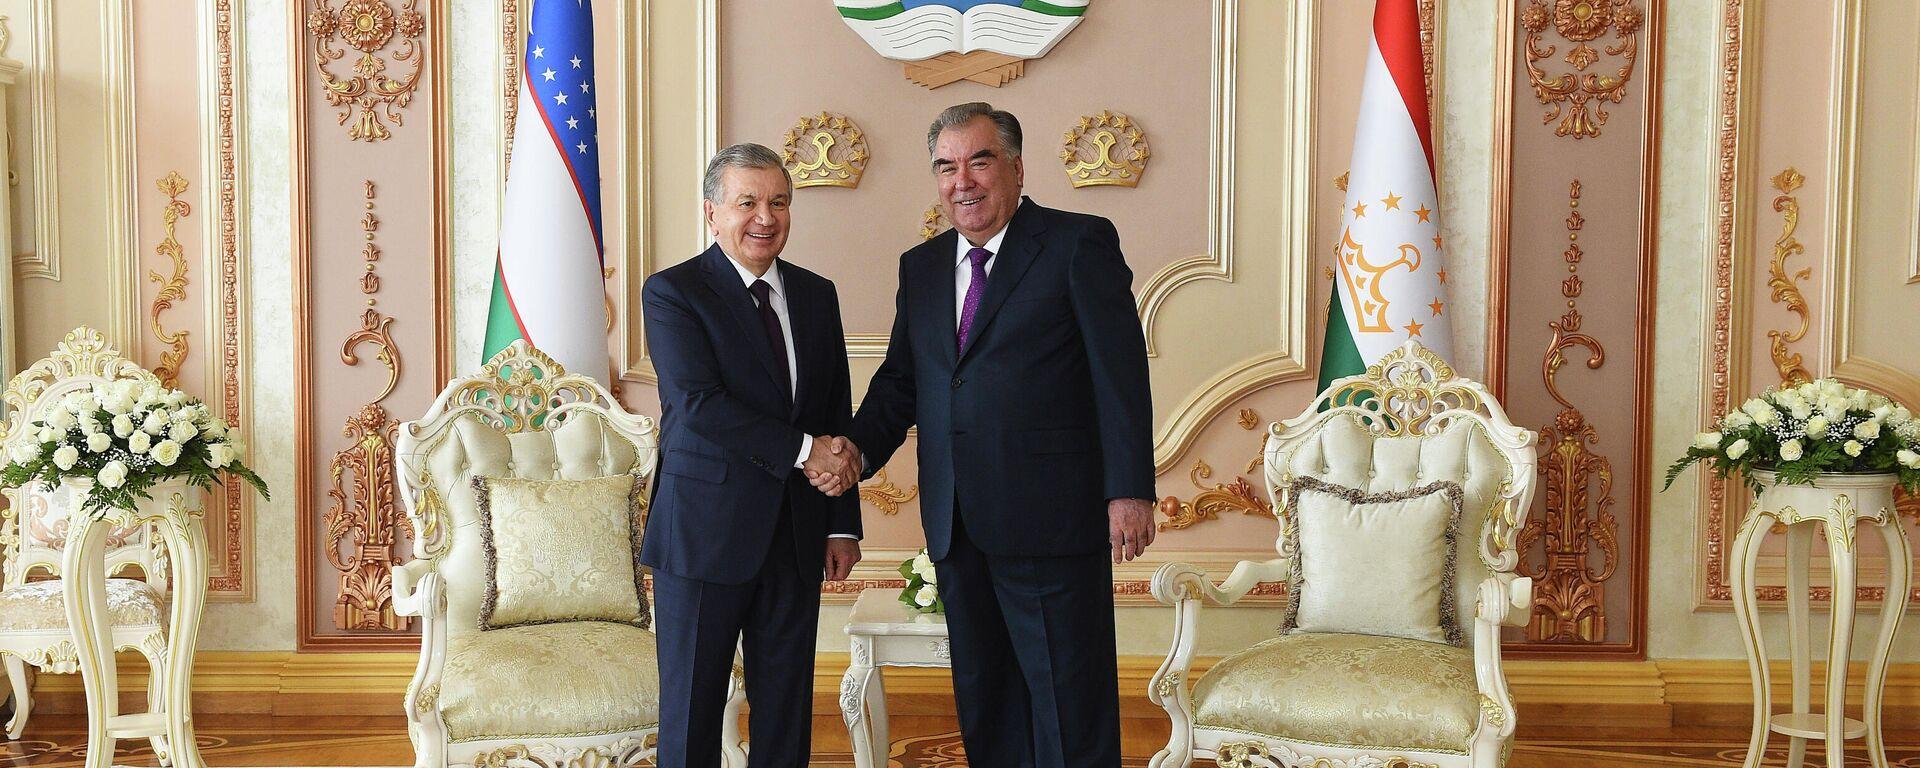 Prezident Uzbekistana Shavkat Mirziyeyev i prezident Tadjikistana Emomali Raxmon - Sputnik Oʻzbekiston, 1920, 09.09.2021